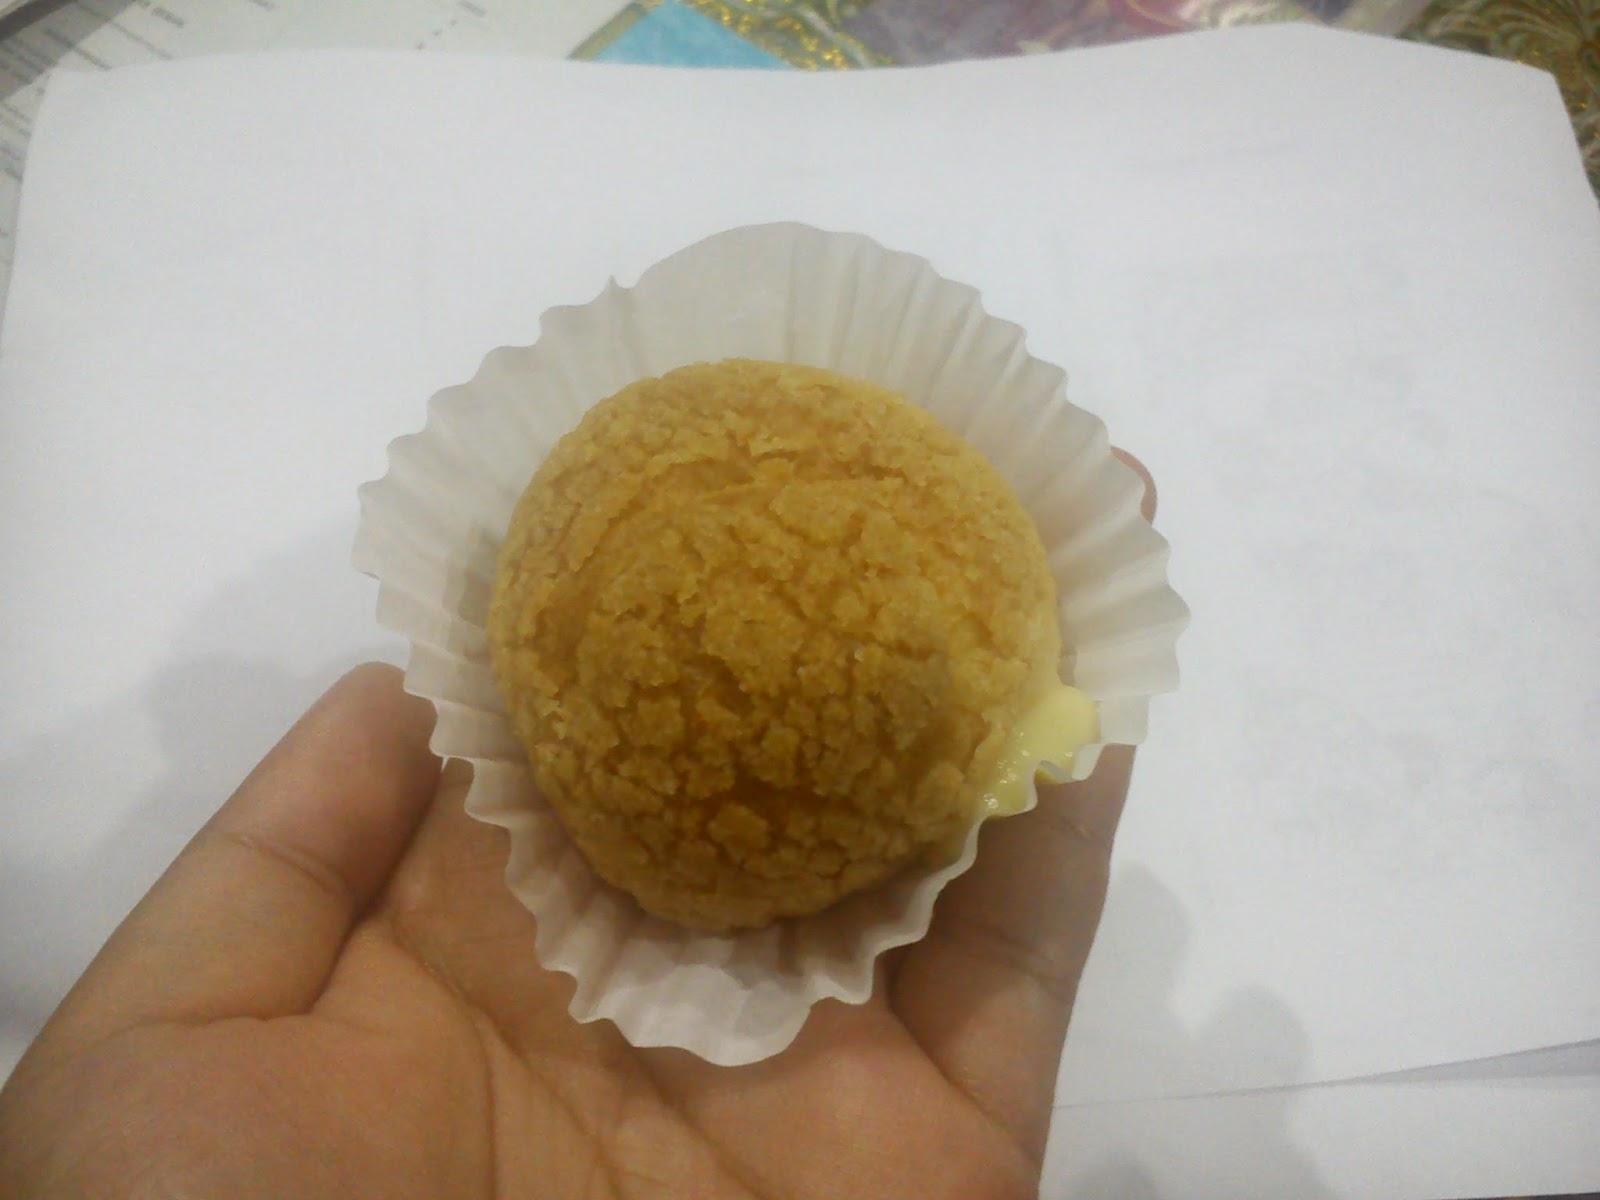 azreen zunairah menikmati japanese cream puff yang gebusss